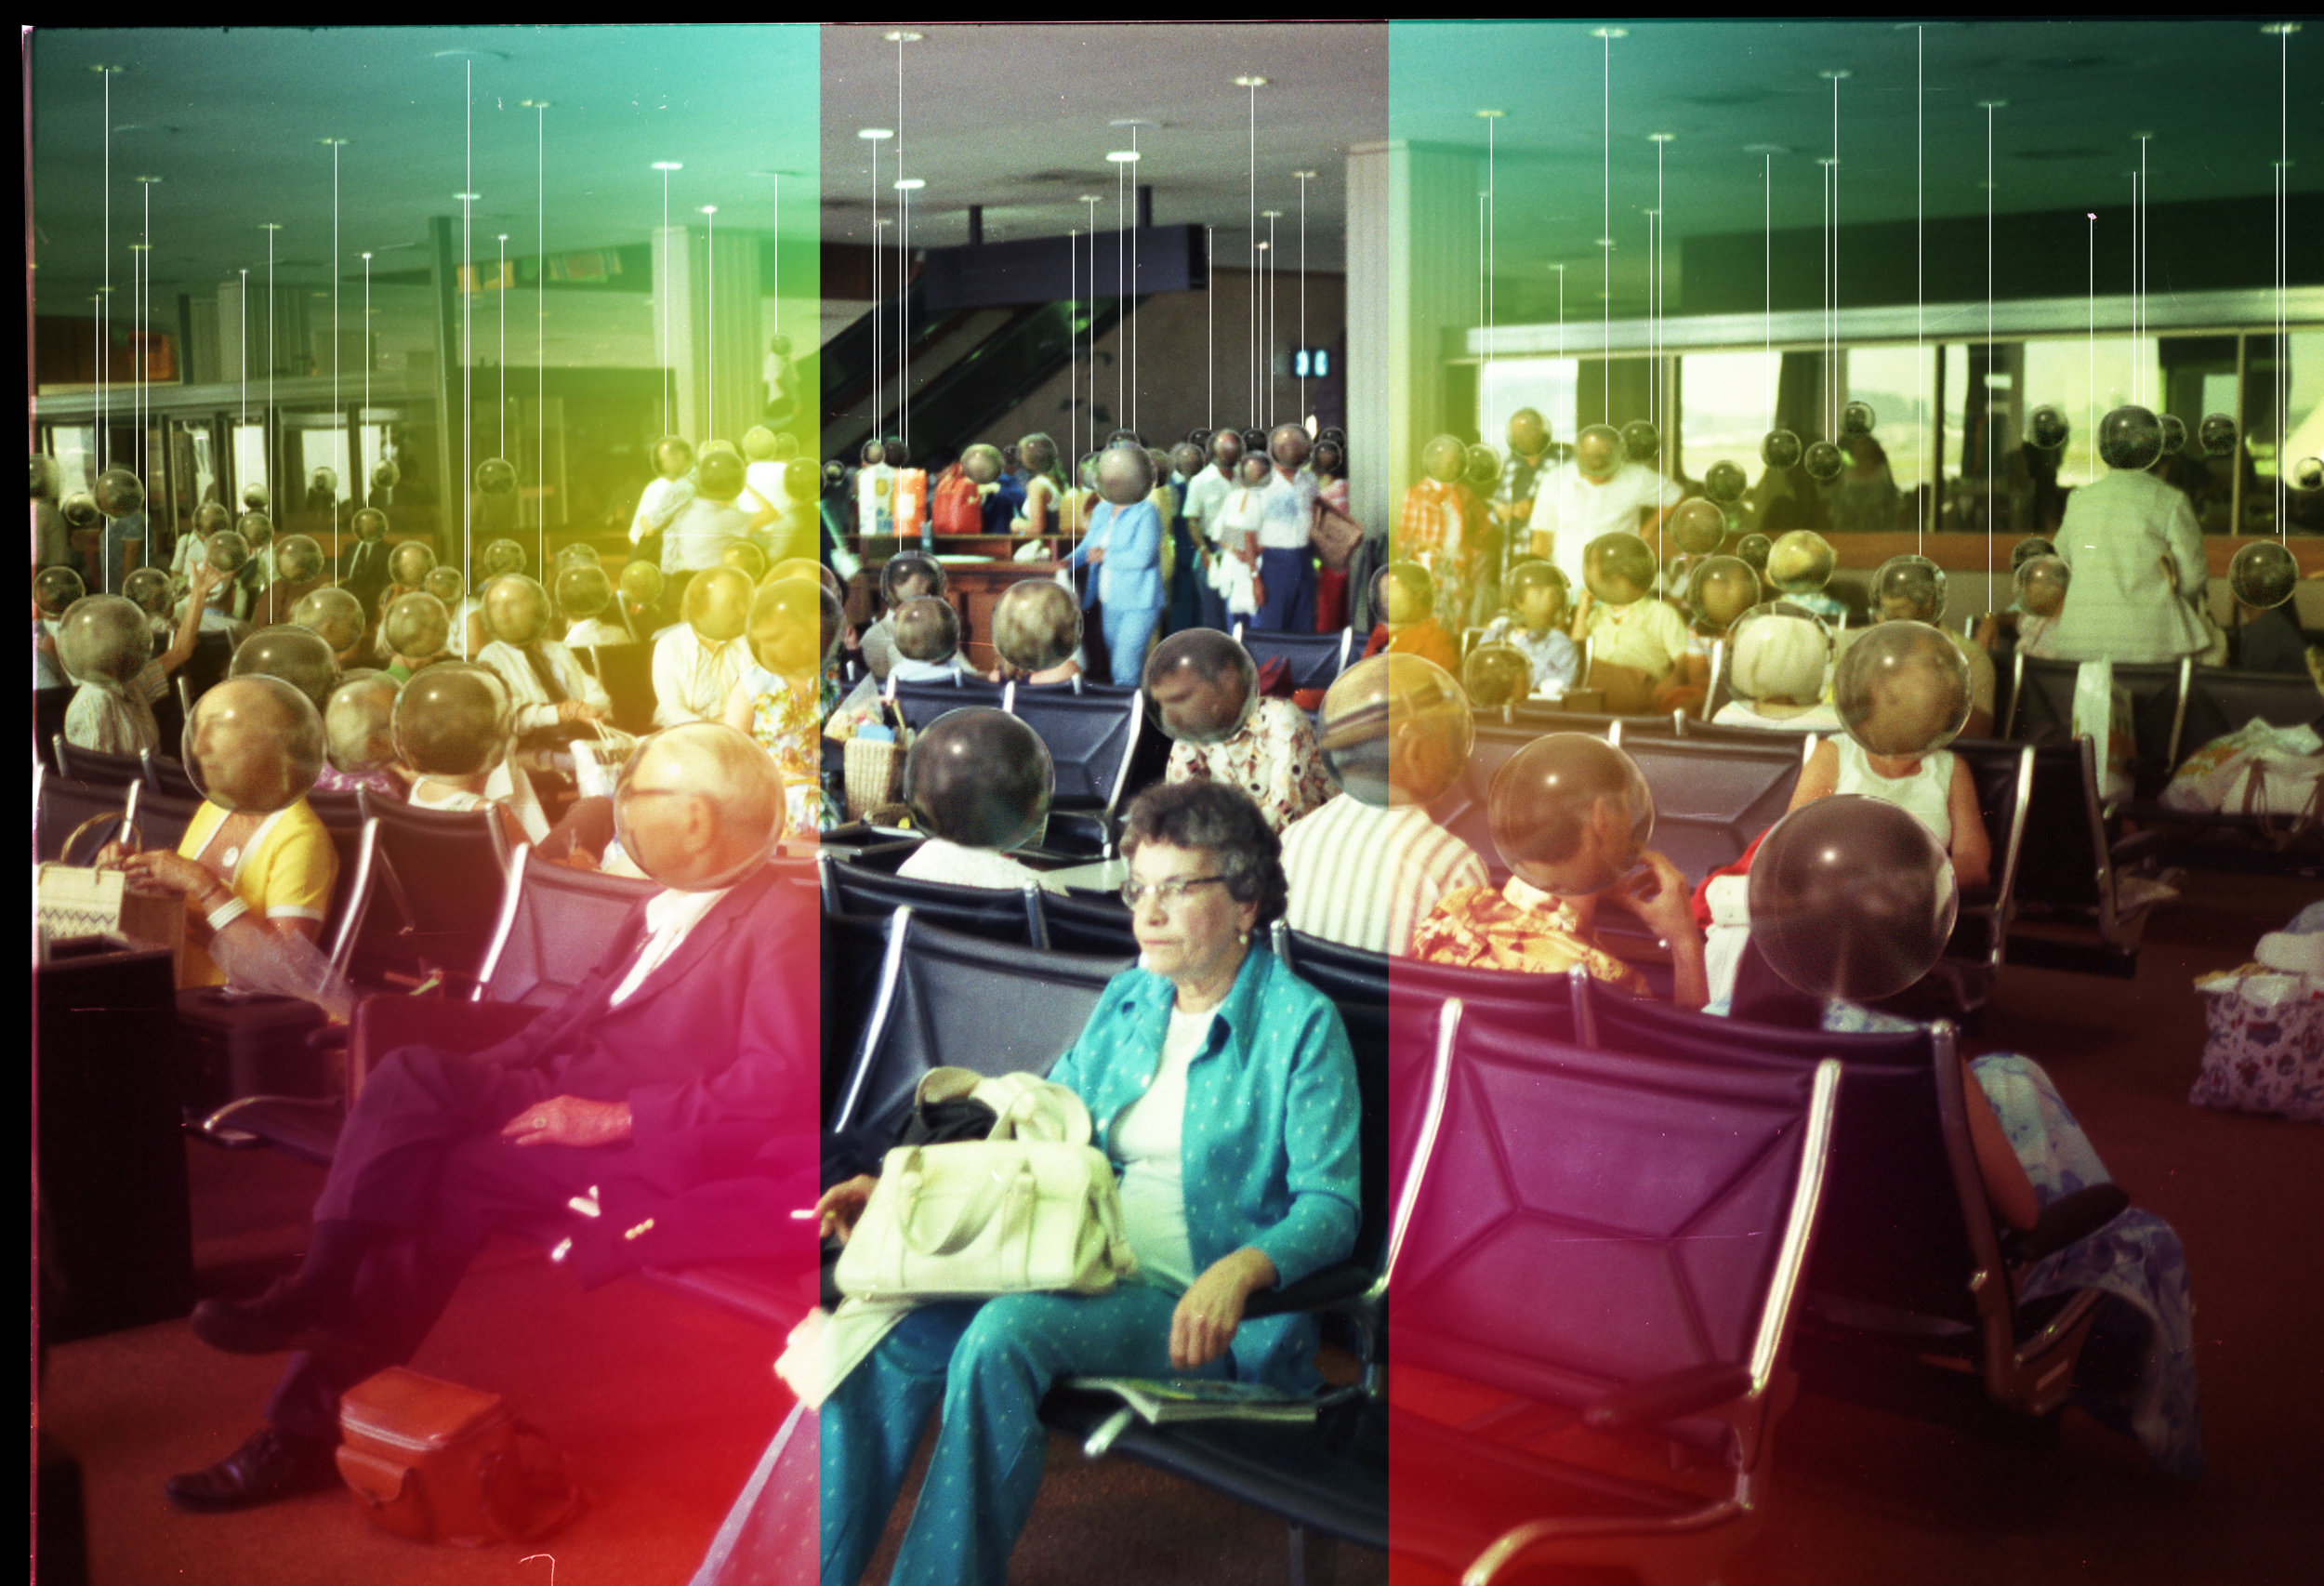 AirportWaiting_14inch_500dpi.jpg